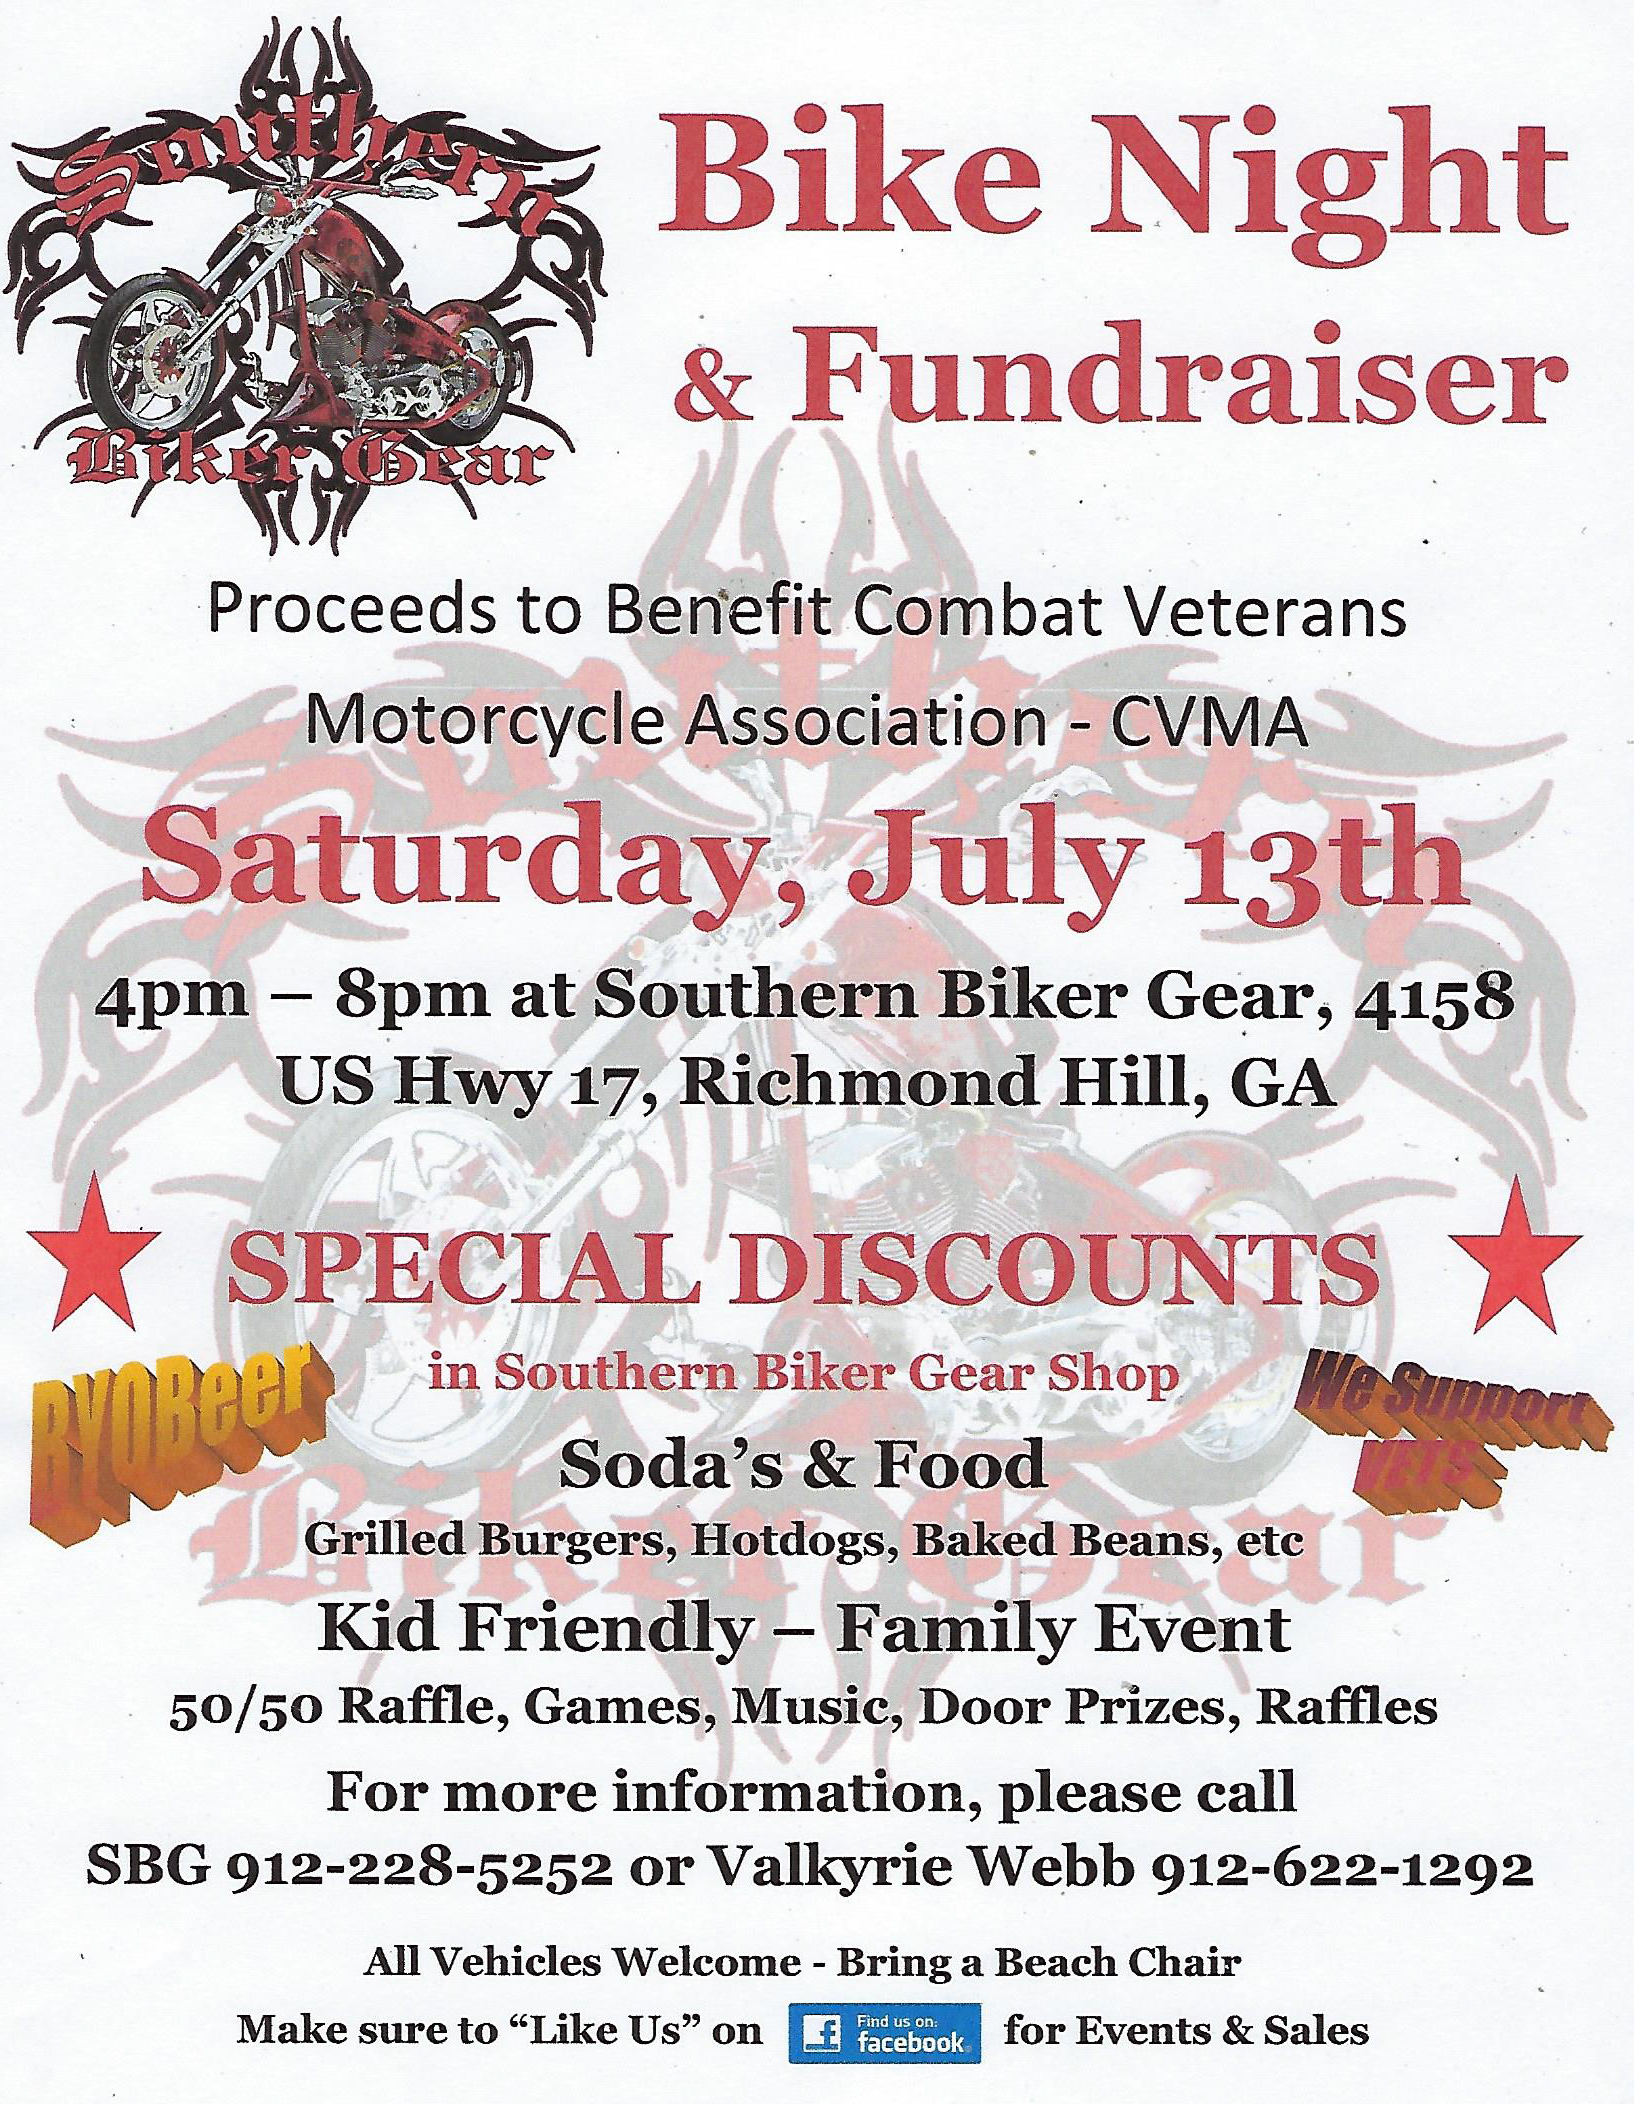 Southern Biker Gear Bike Night & Fundraiser @ Southern Biker Gear | Richmond Hill | Georgia | United States